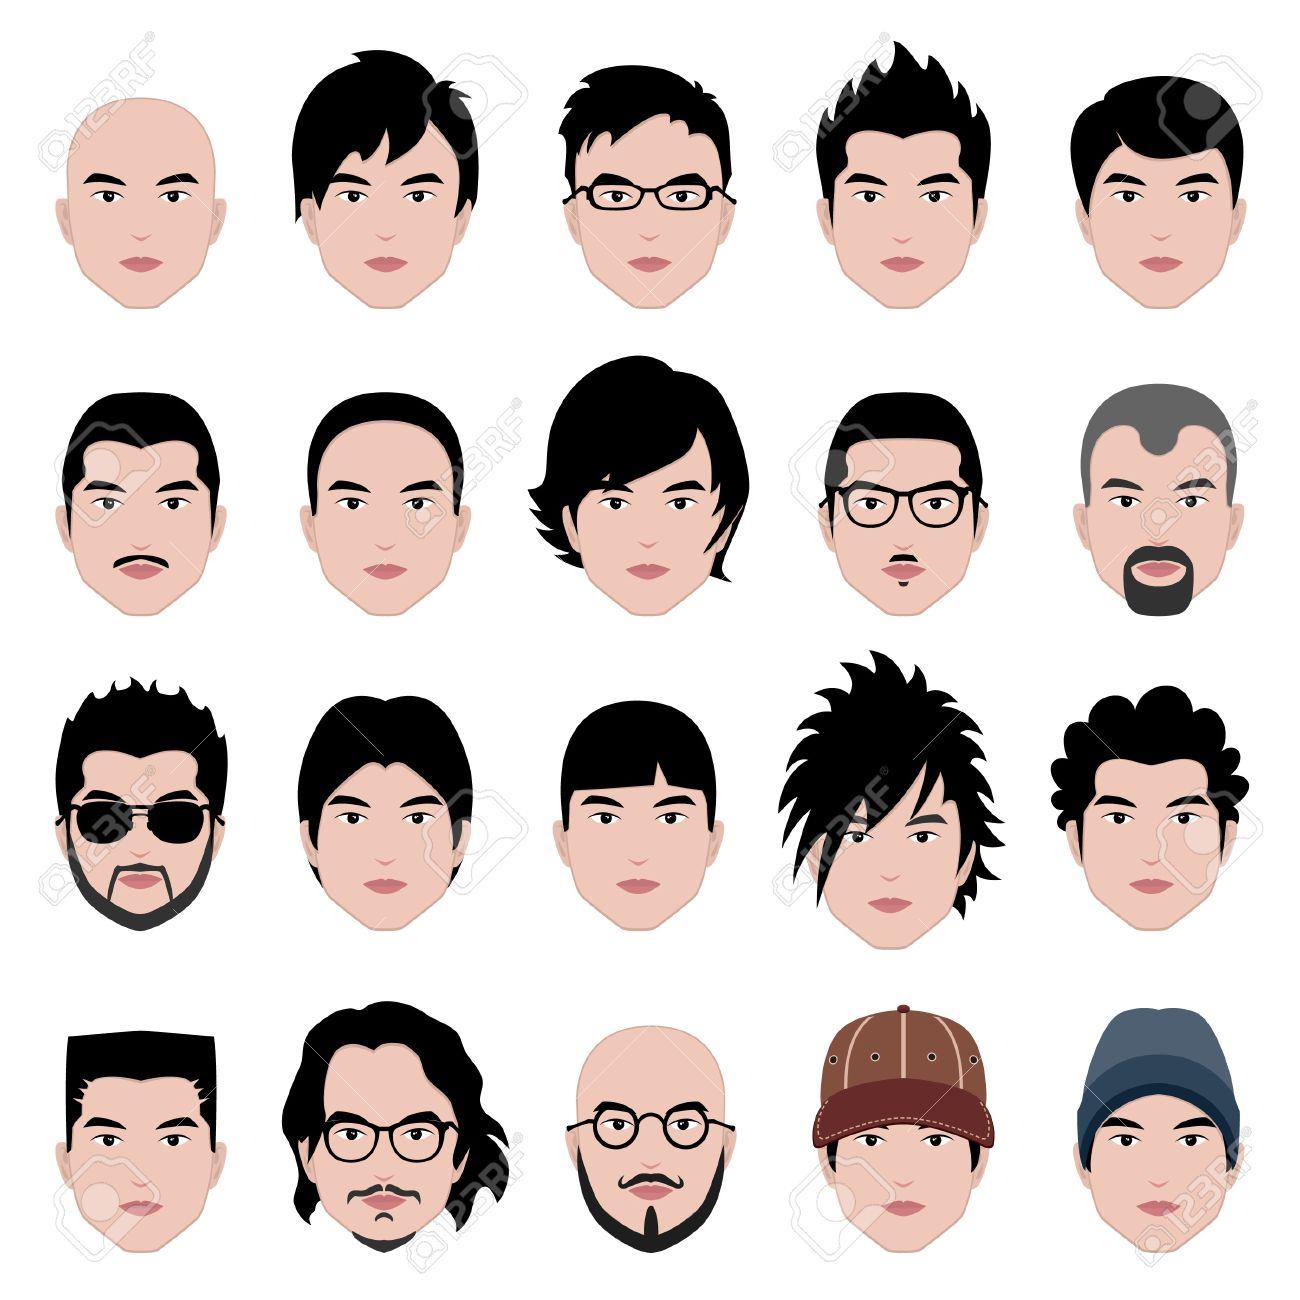 Strange Man Men Male Human Face Head Hair Hairstyle Mustache Bald People Short Hairstyles For Black Women Fulllsitofus